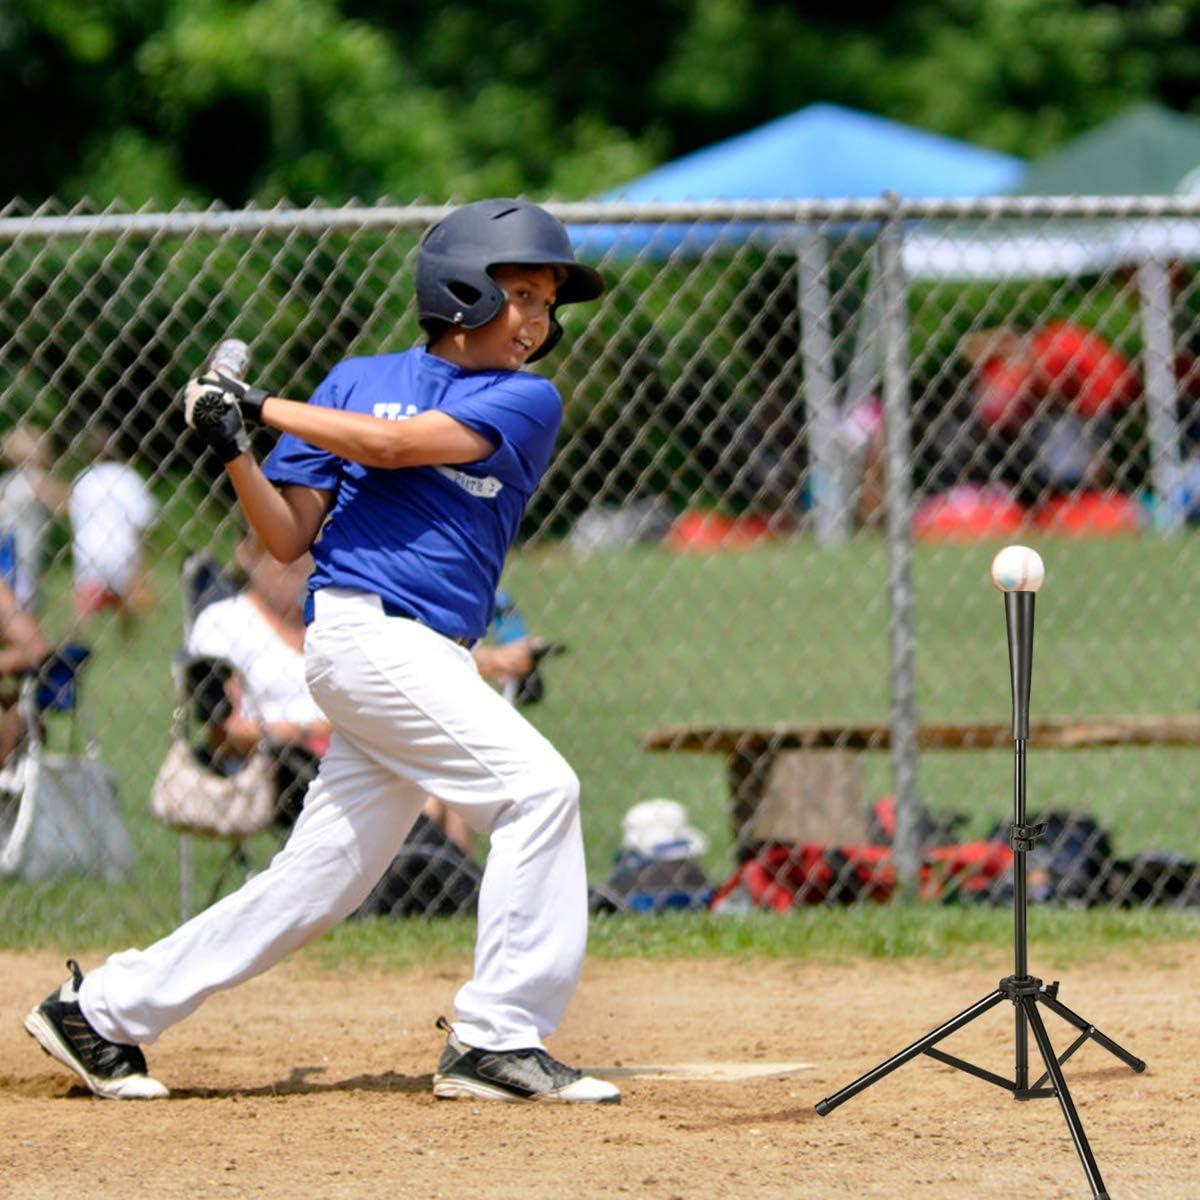 Adjustable Baseball Softball Tripod for Batting Training Practice with Carrying Bag Goplus Batting Tee